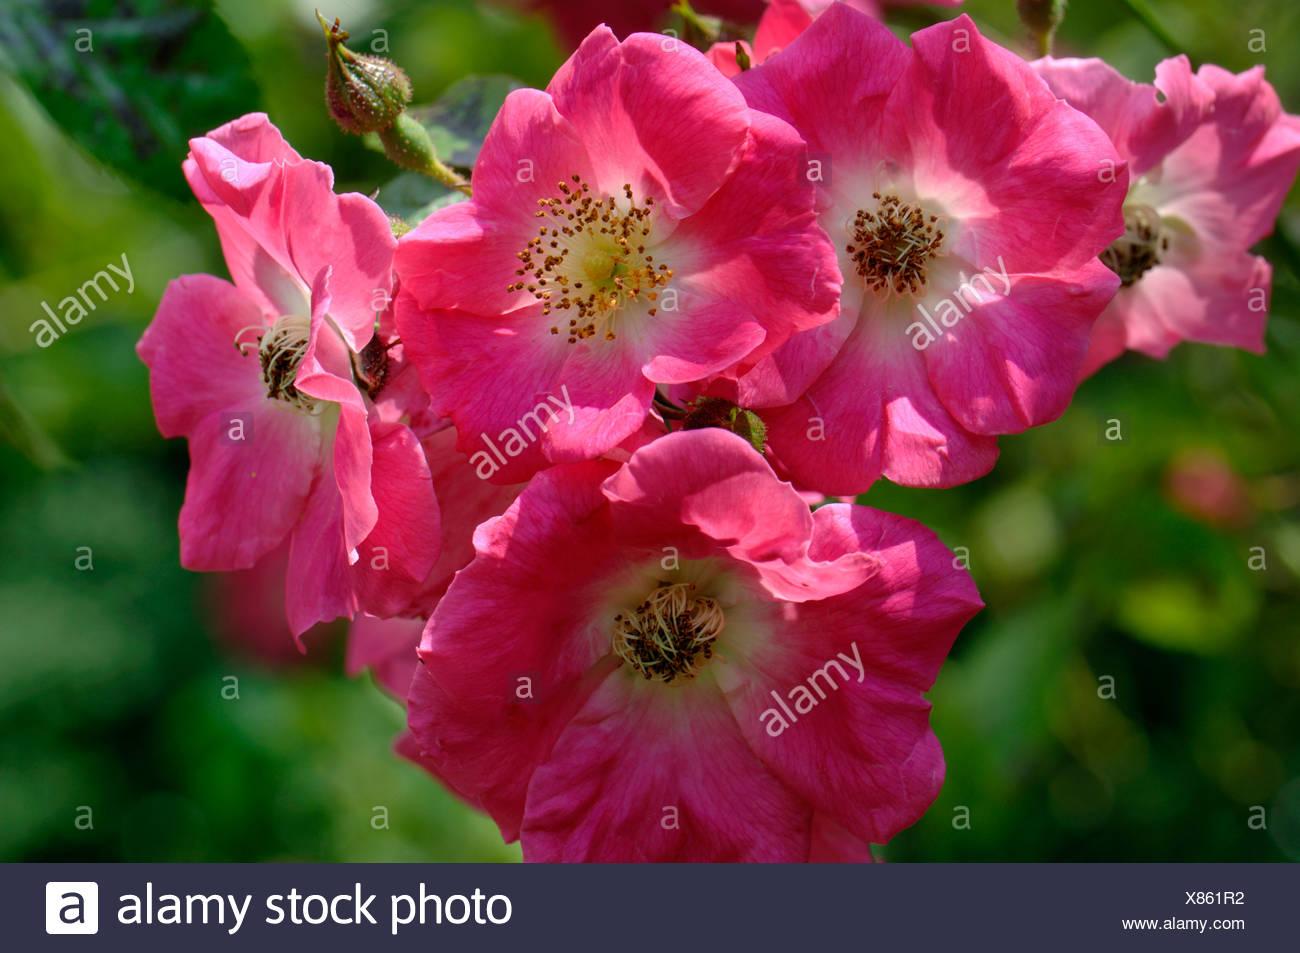 Rosa America Pillar deep pink flowers on a rambling climbing rose - Stock Image